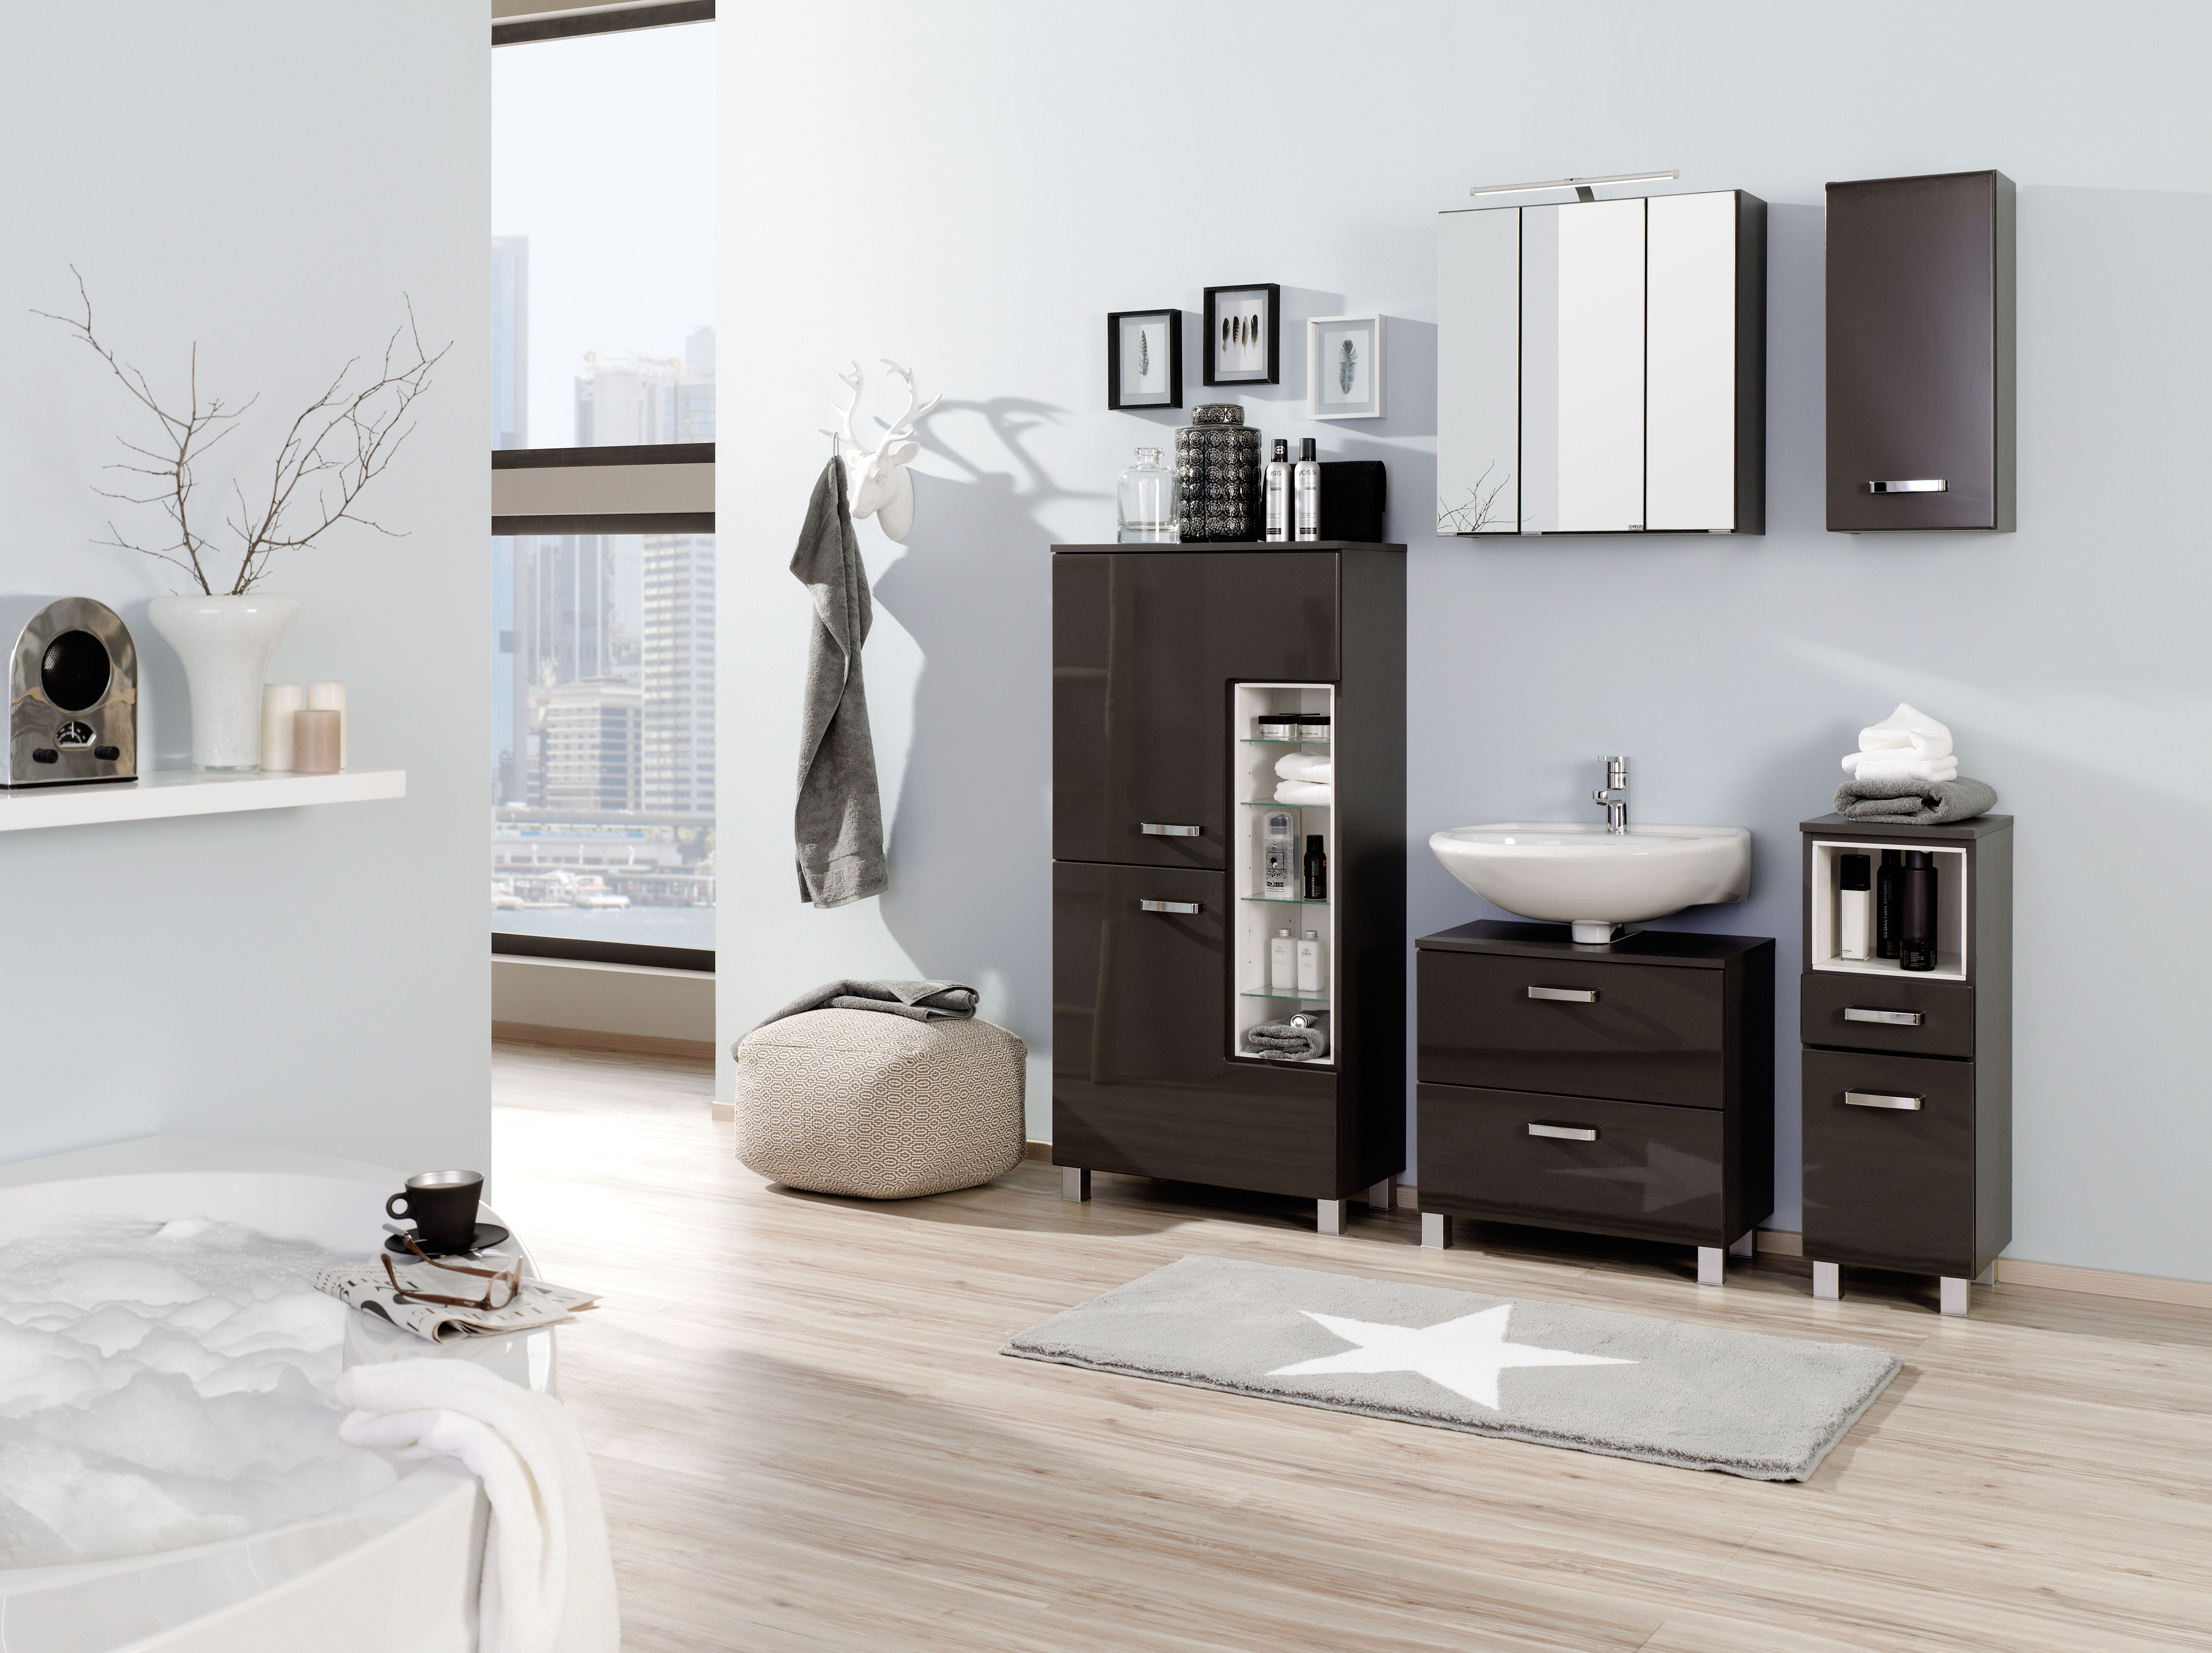 midischrank 65 ancona von held m bel grau hgl graphitgrau. Black Bedroom Furniture Sets. Home Design Ideas